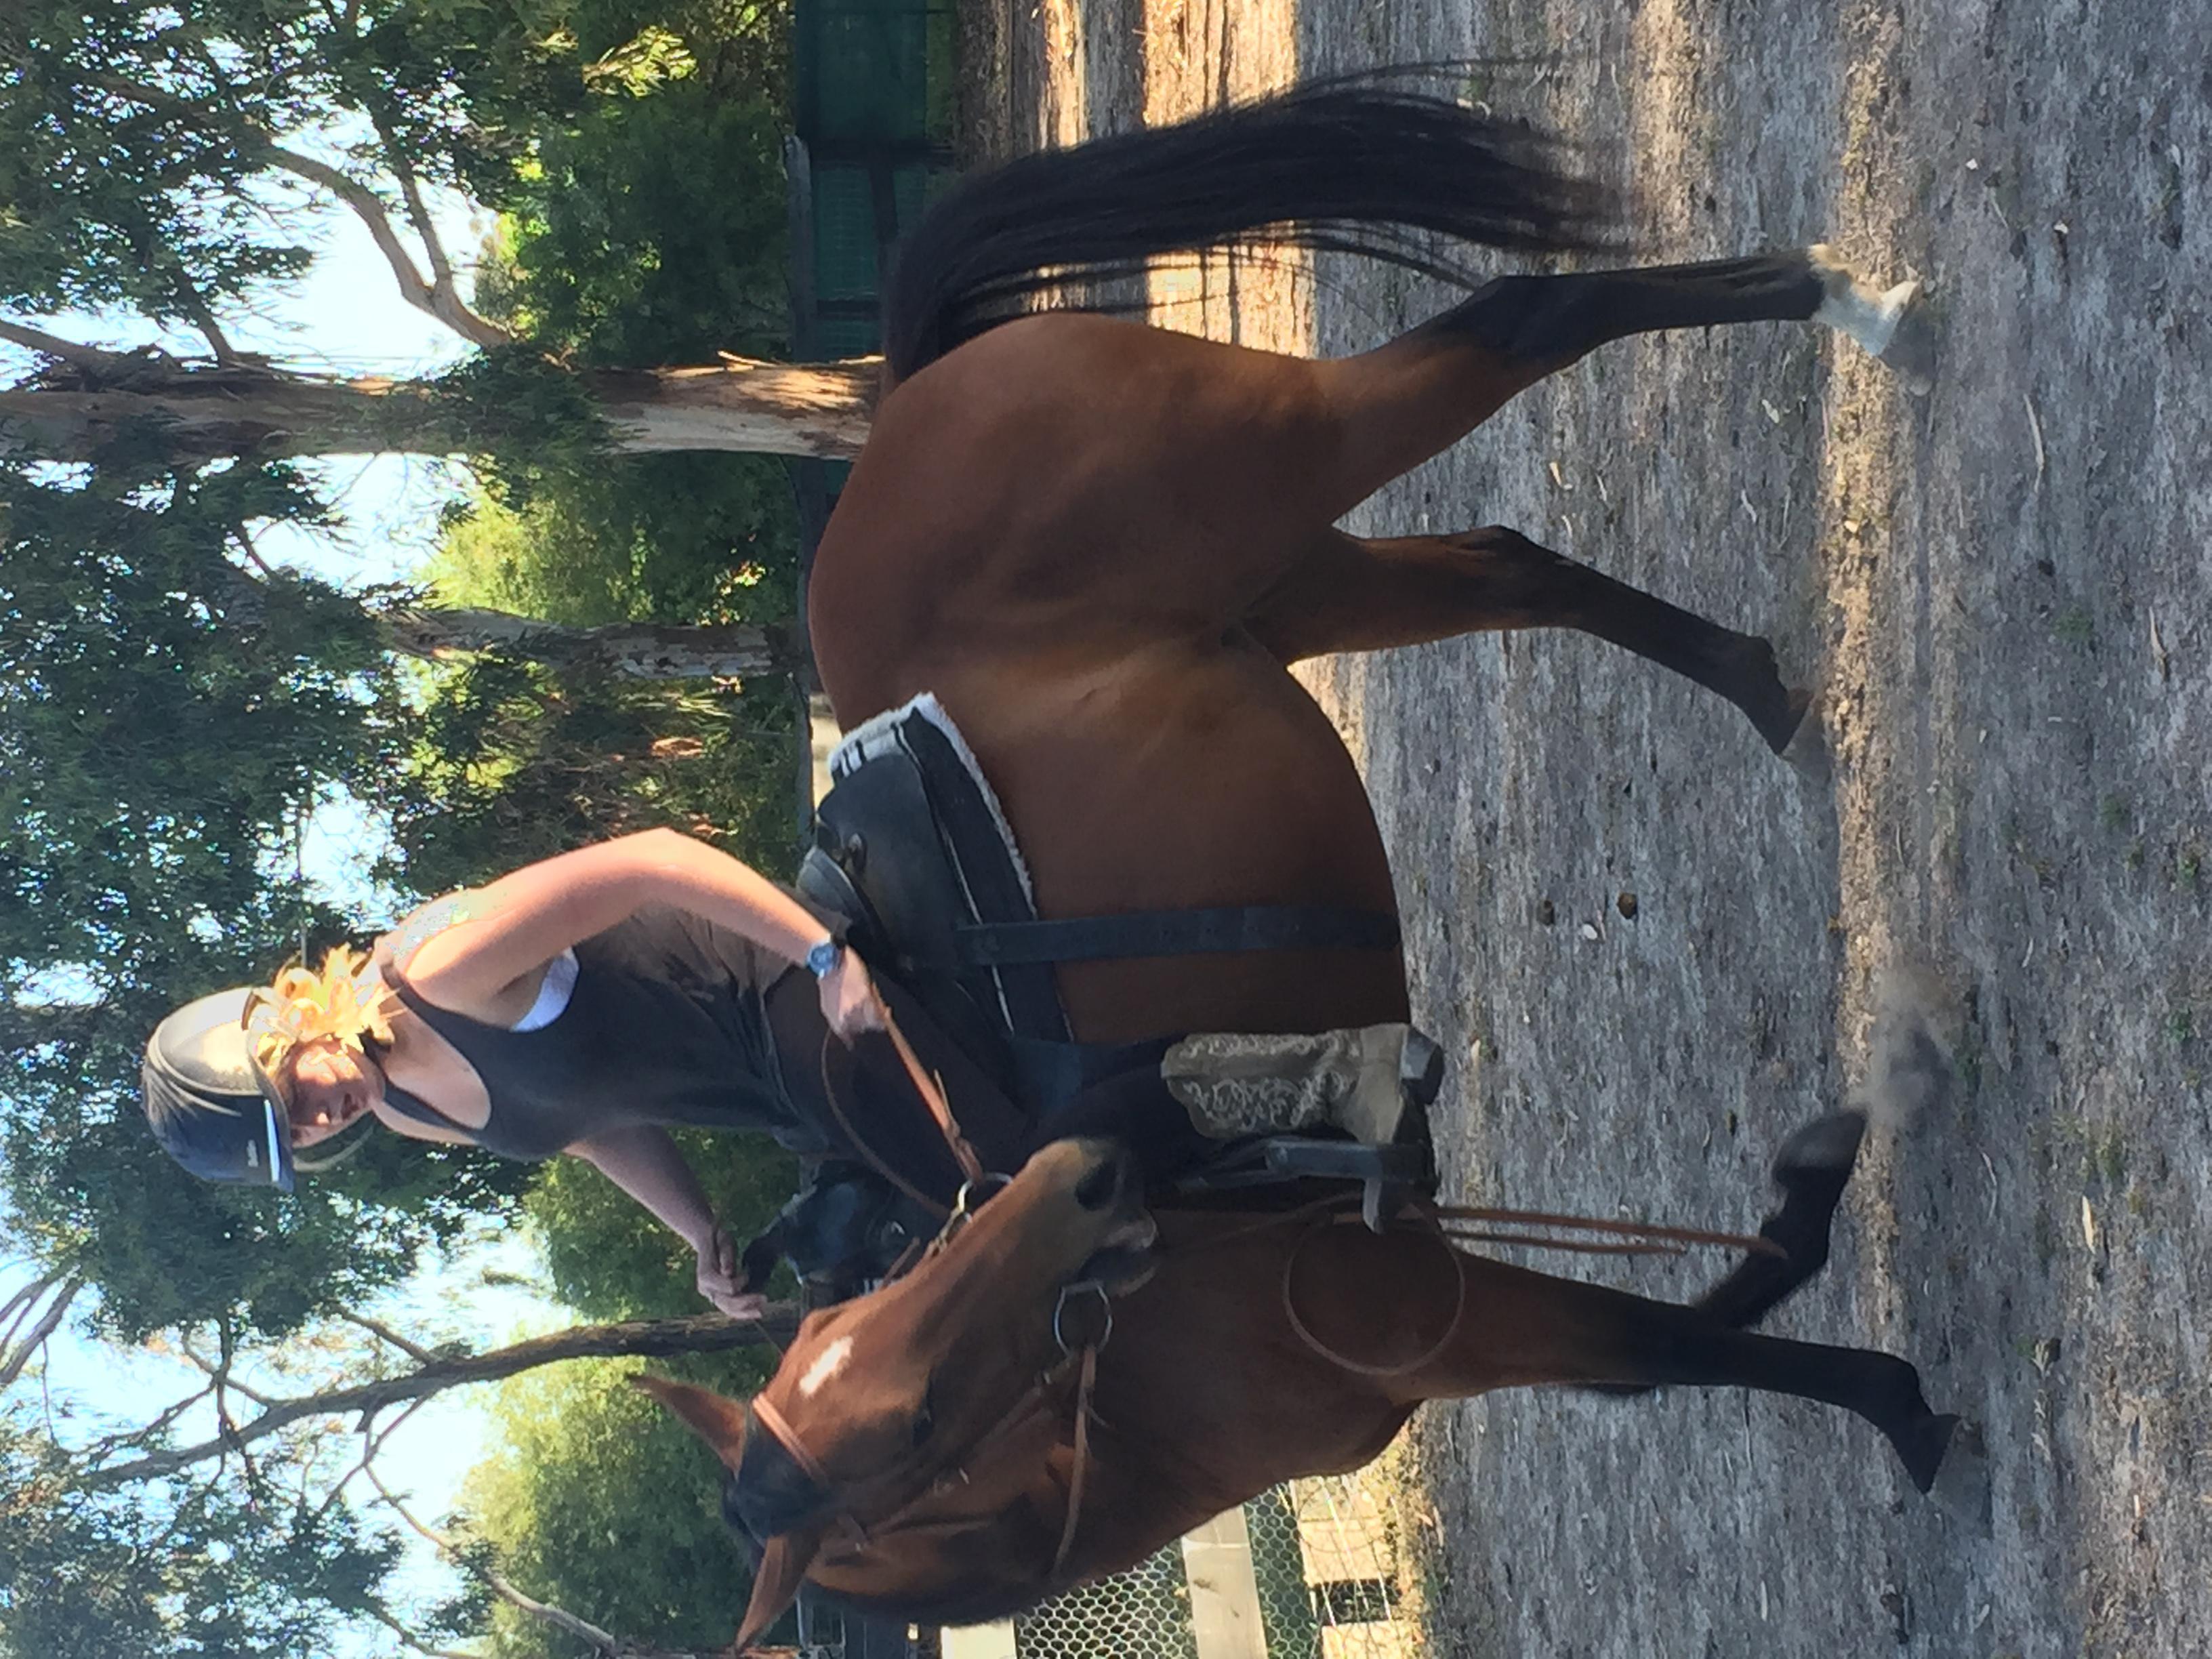 Quarter horse for sale